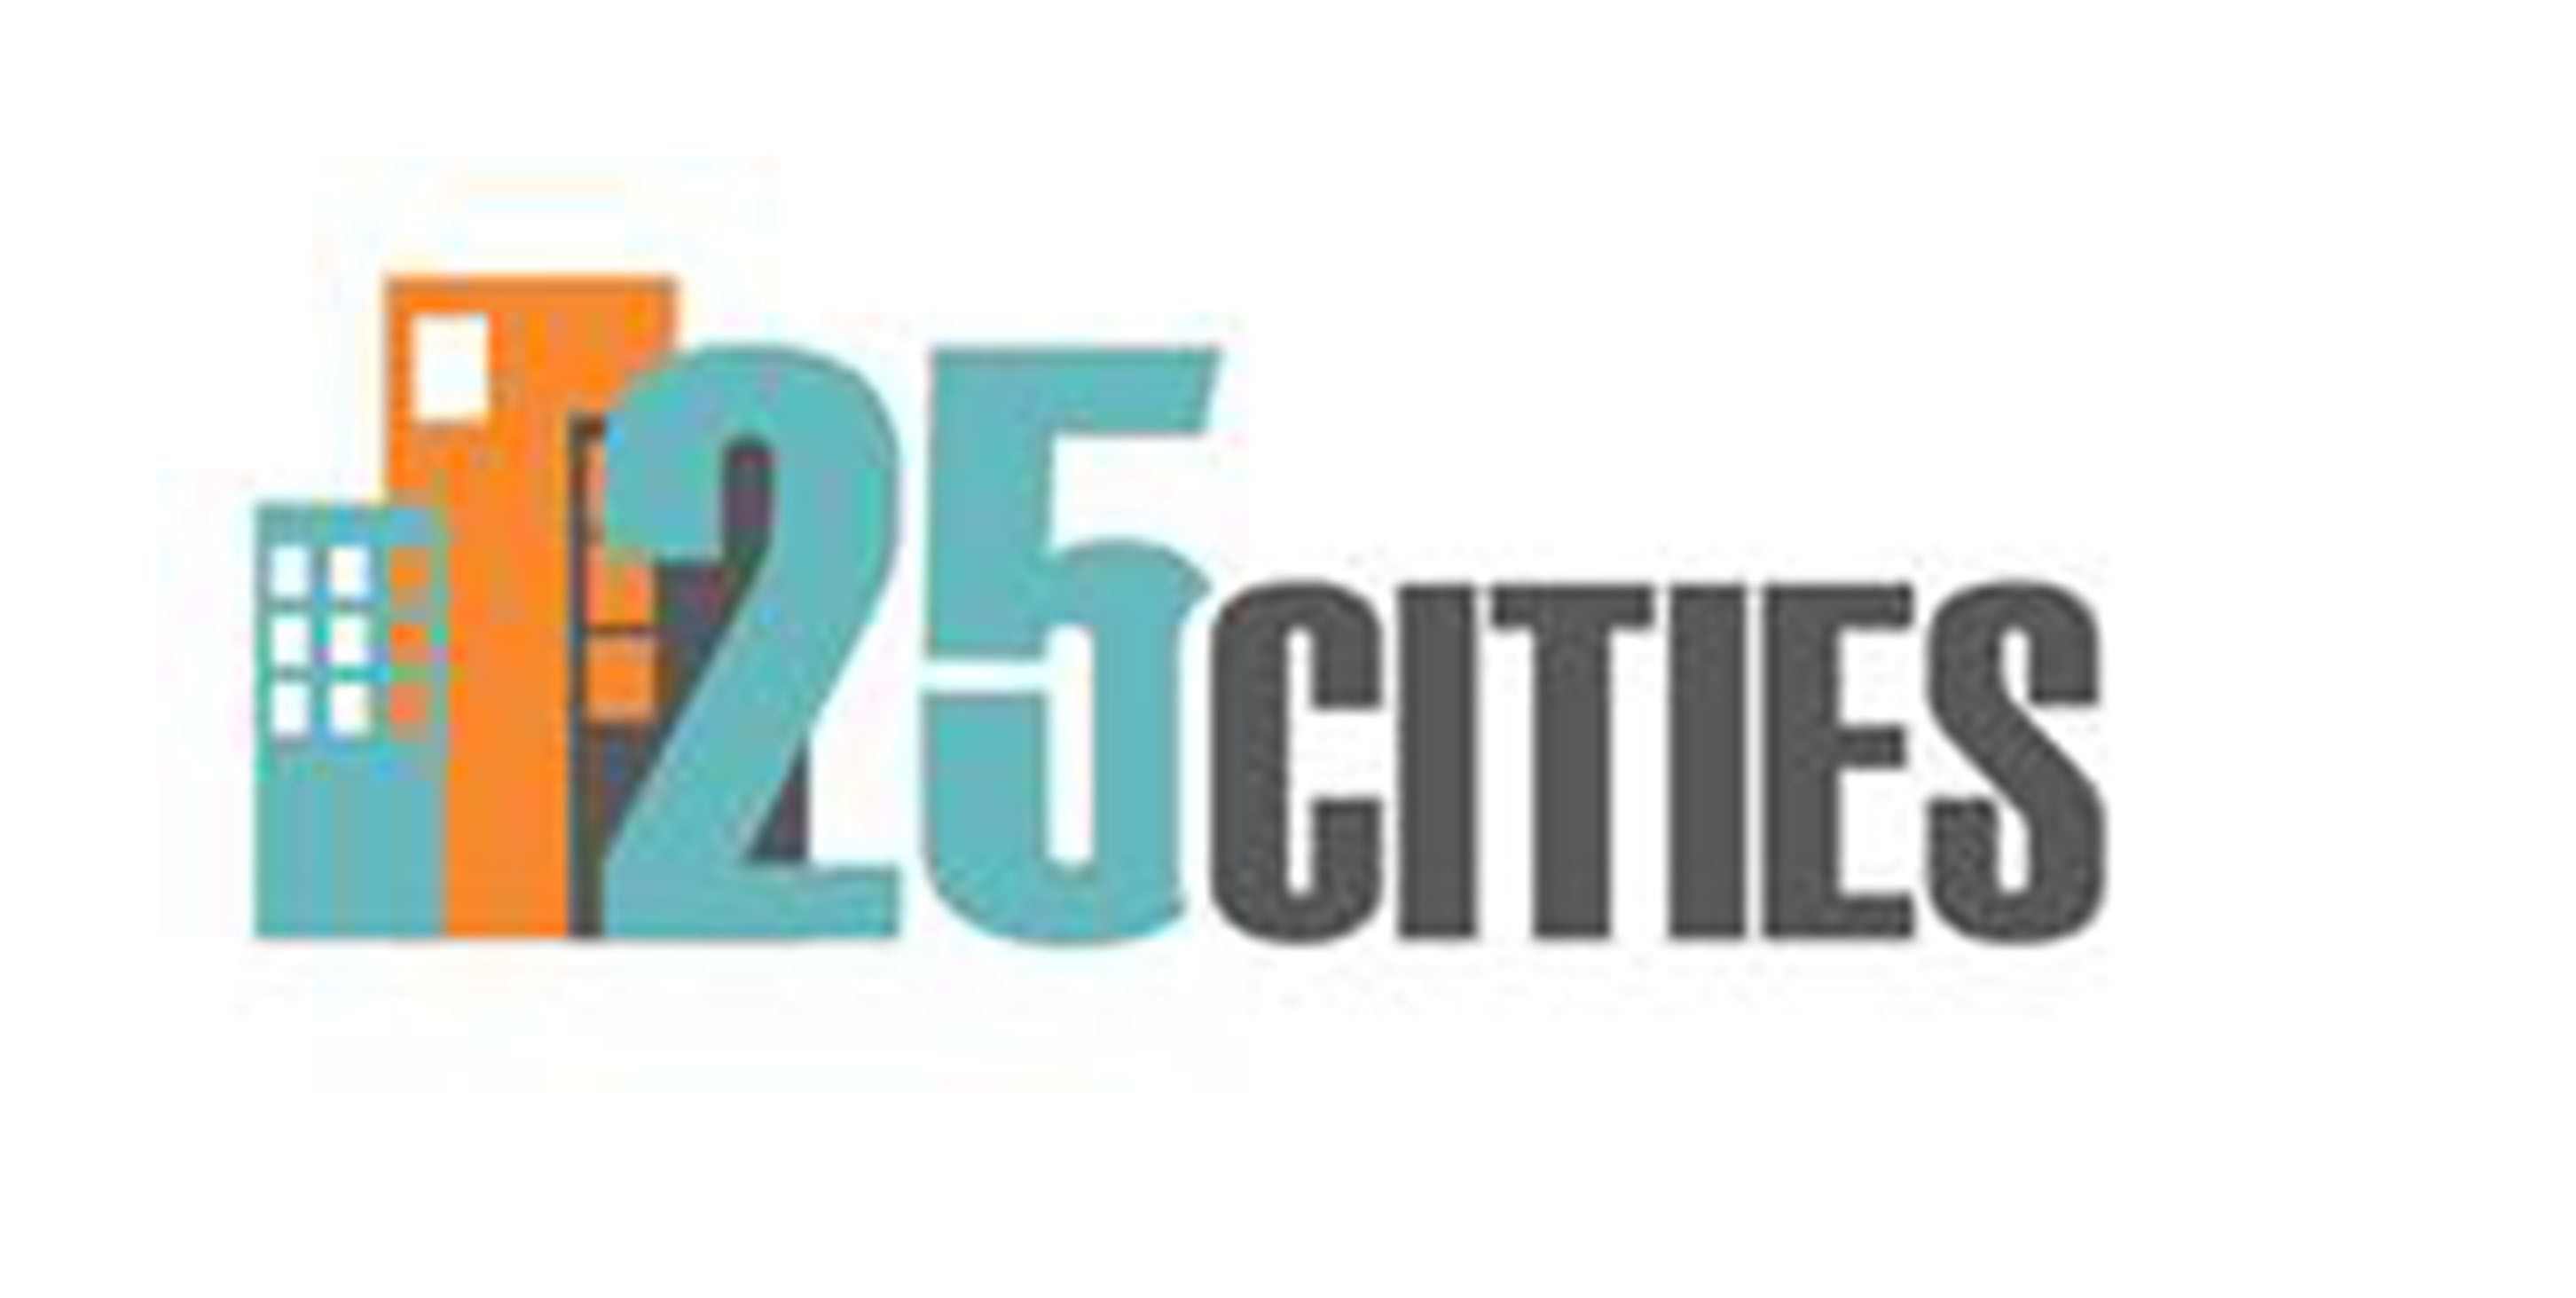 25-cities-logo.jpg